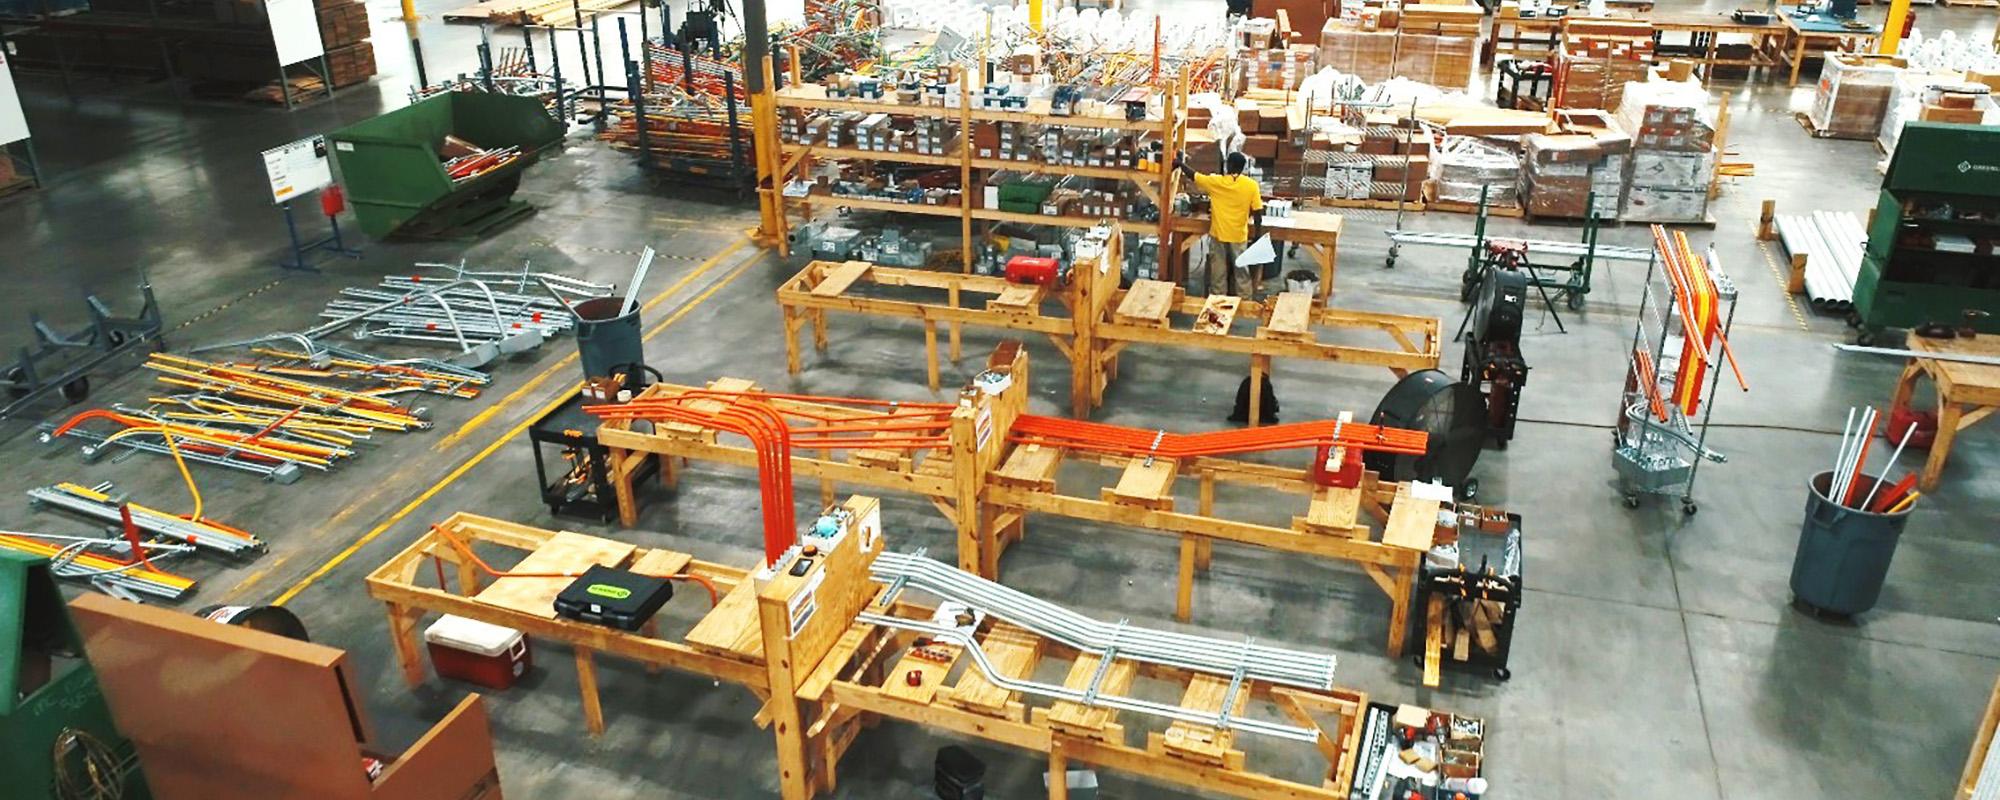 MUSC Prefabrication Warehouse